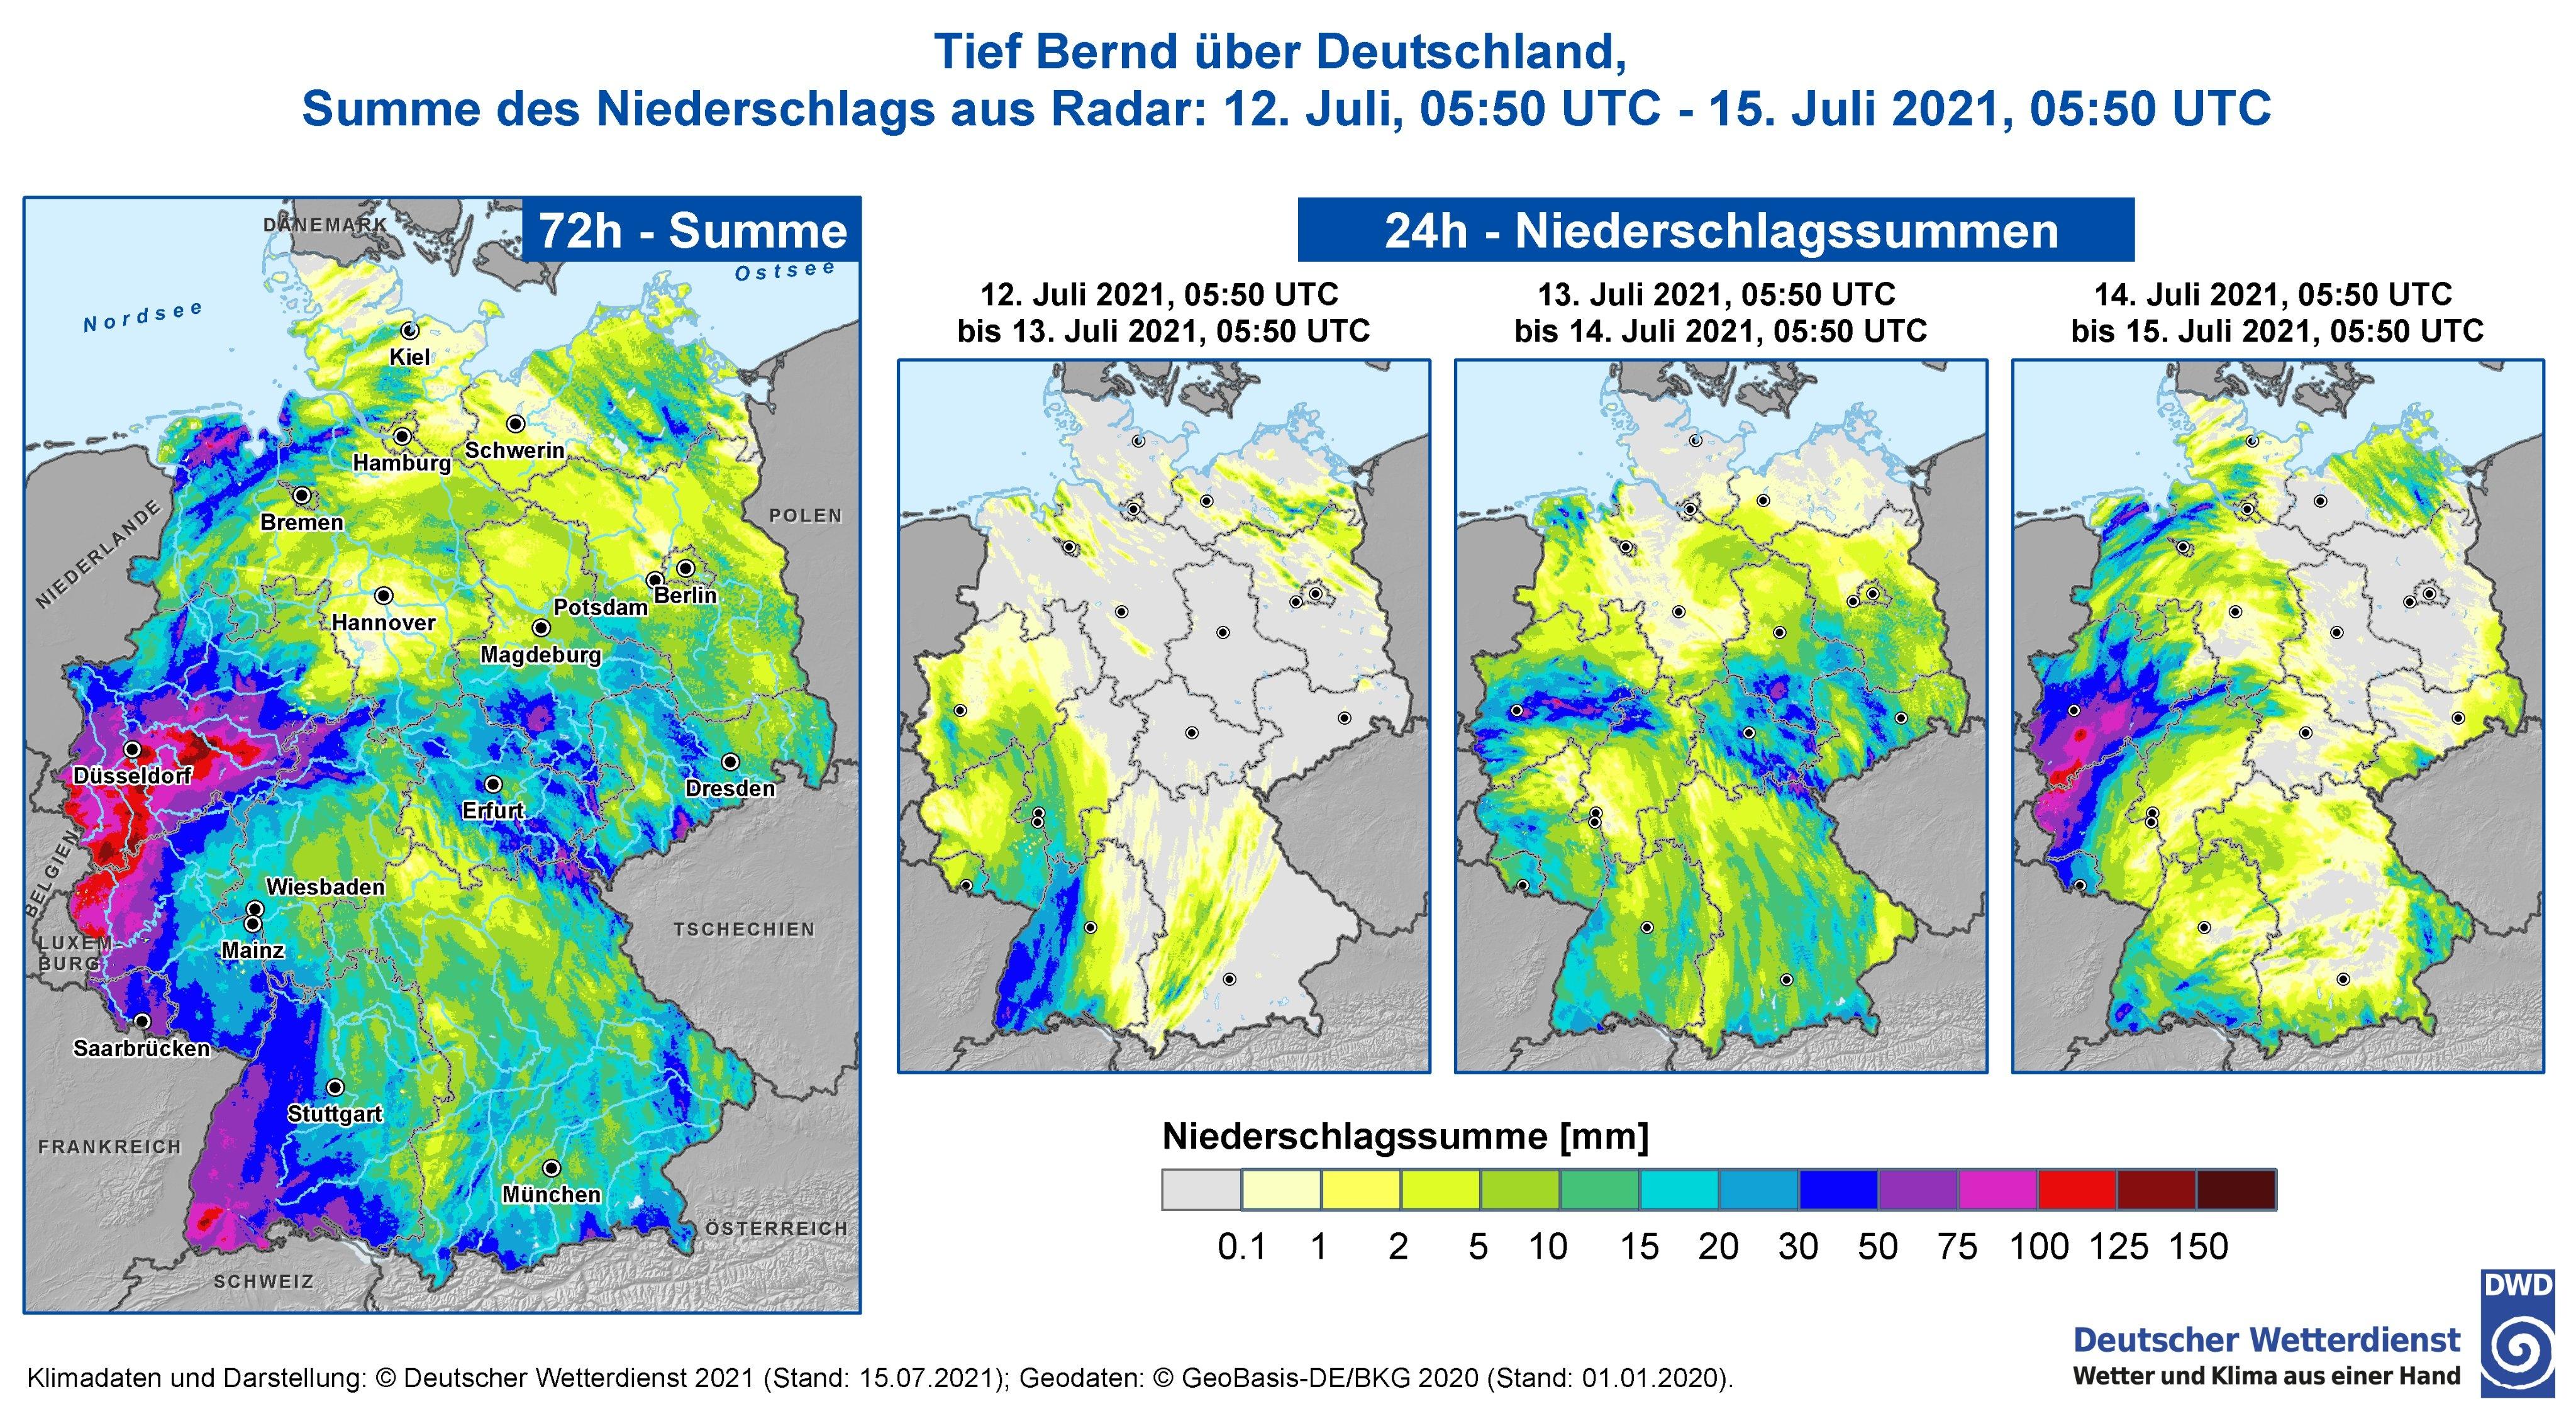 Precipitation accumulations for Germany